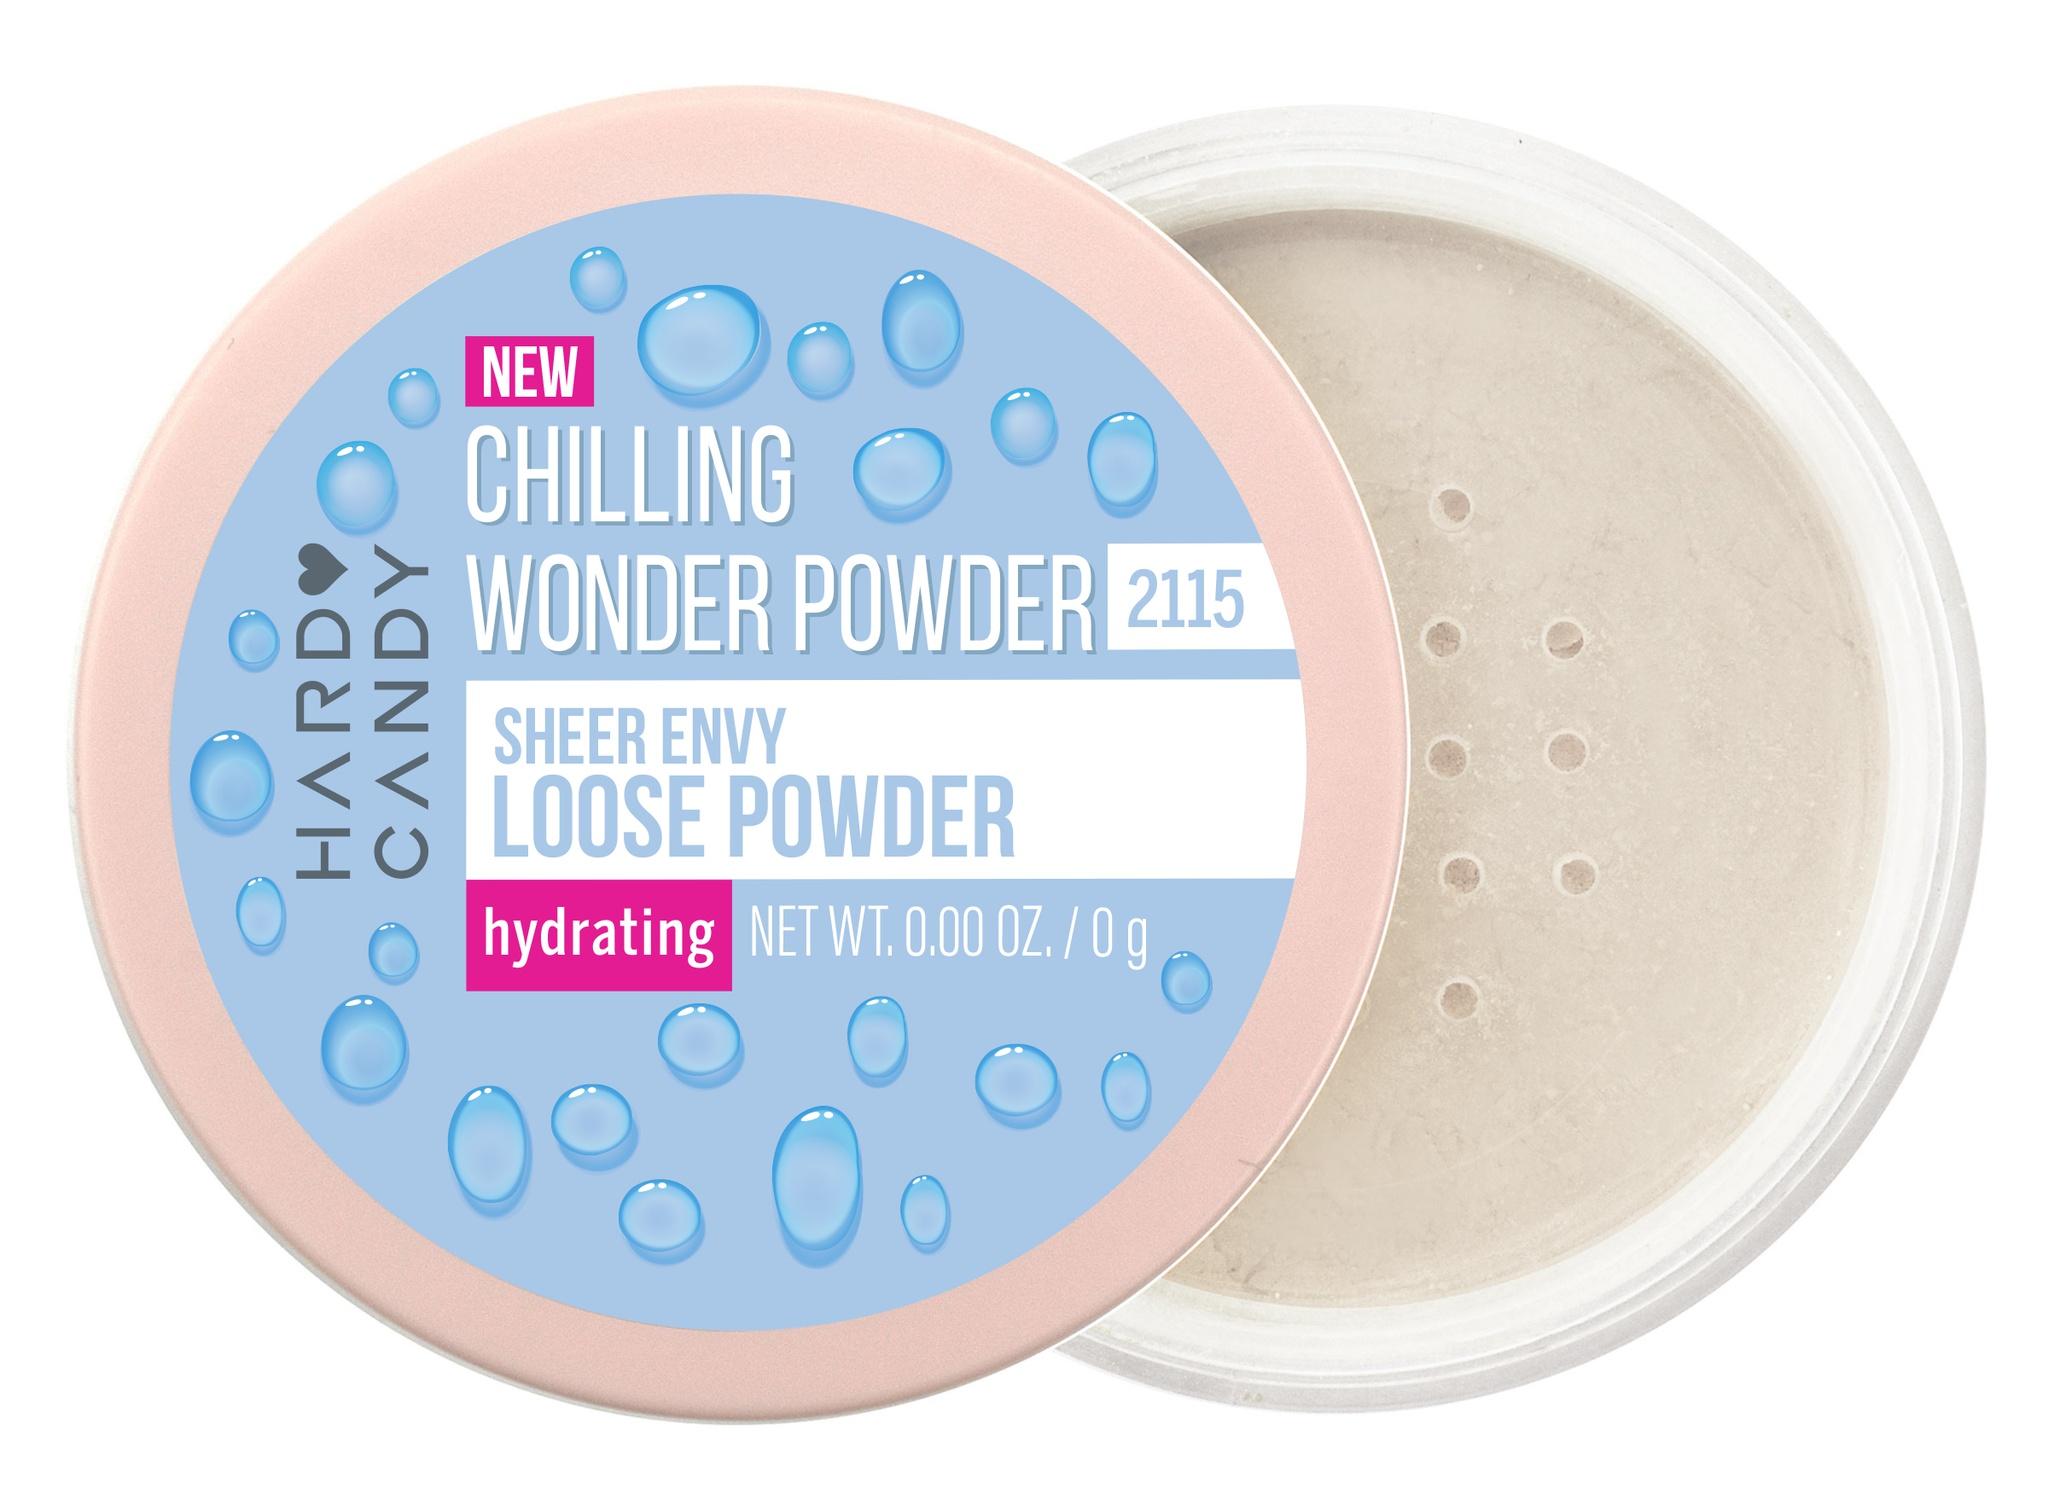 Hard Candy Hydrating Chilling Wonder Powder